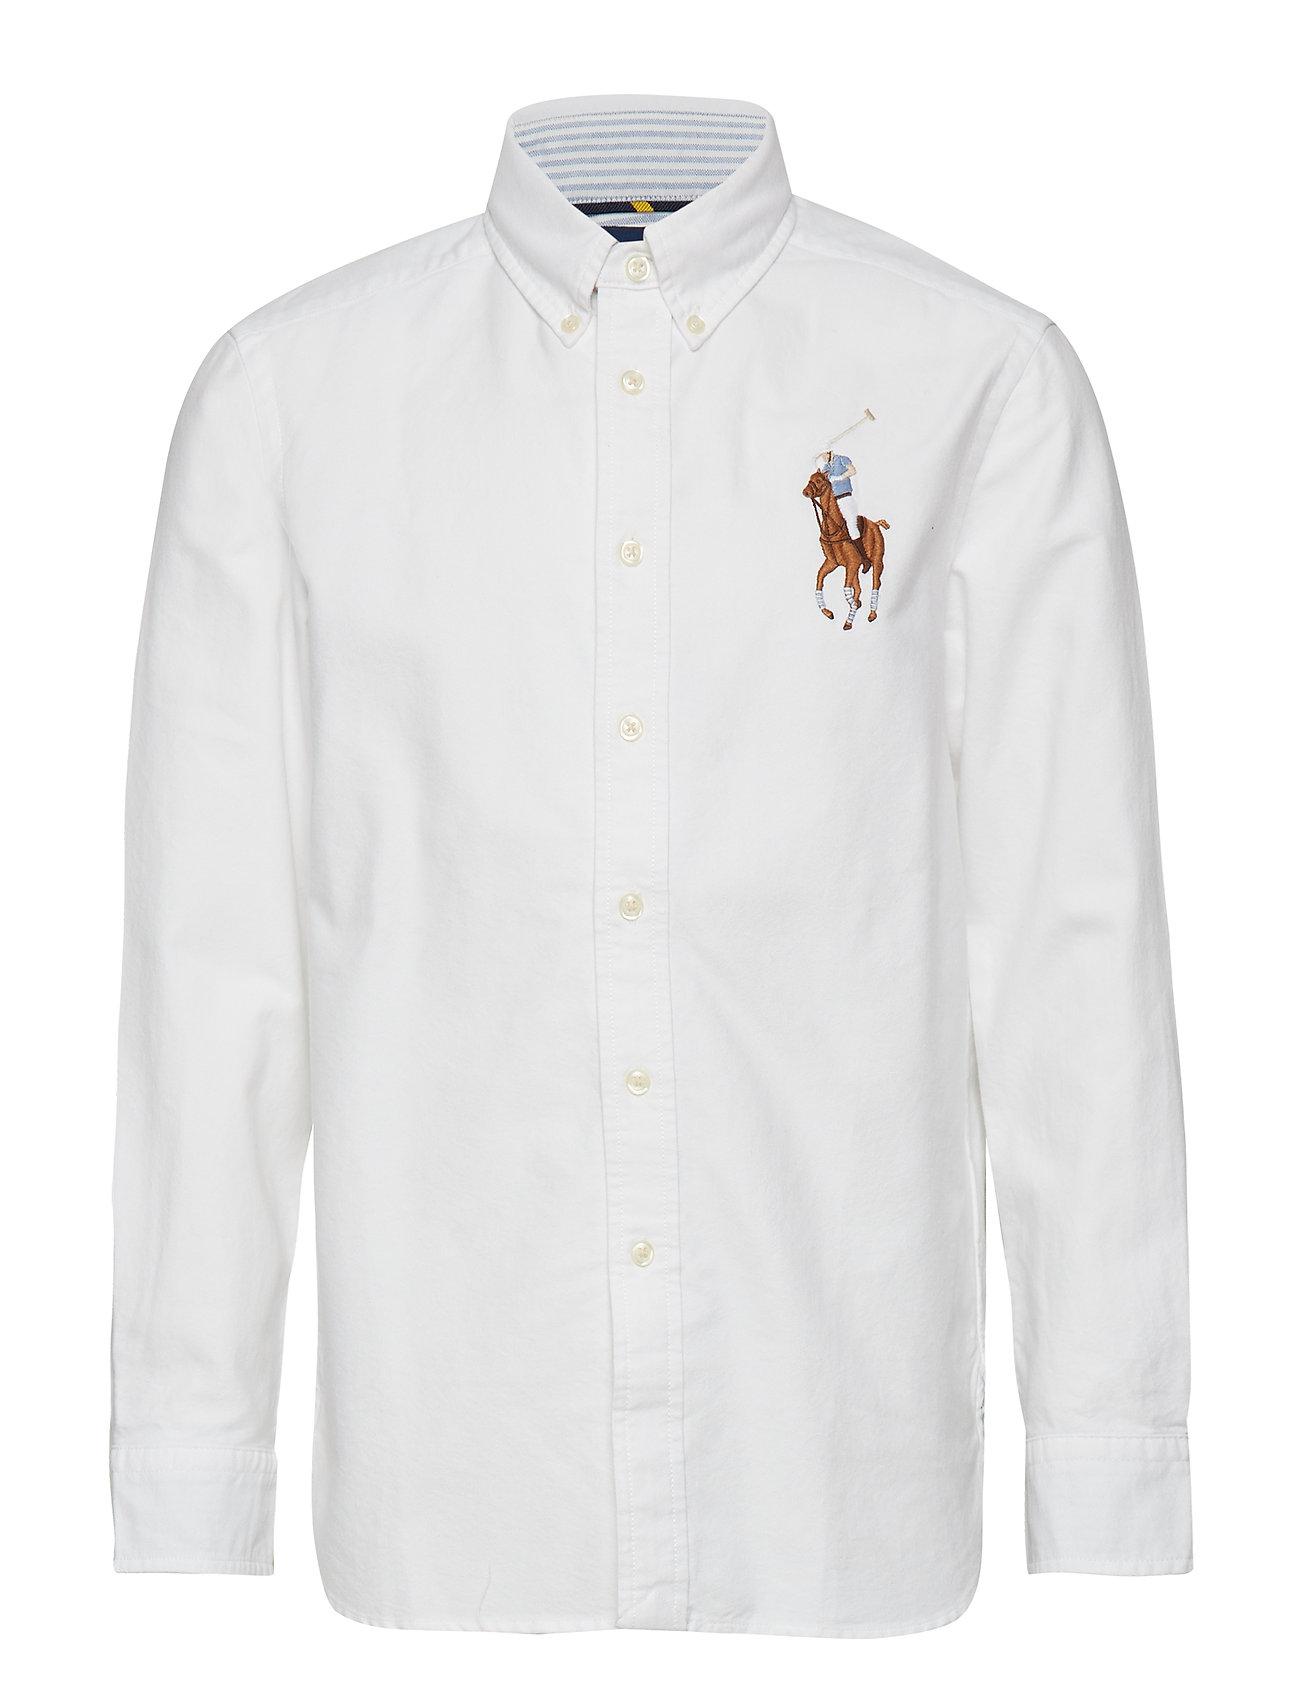 Ralph Lauren Kids Big Pony Cotton Oxford Shirt